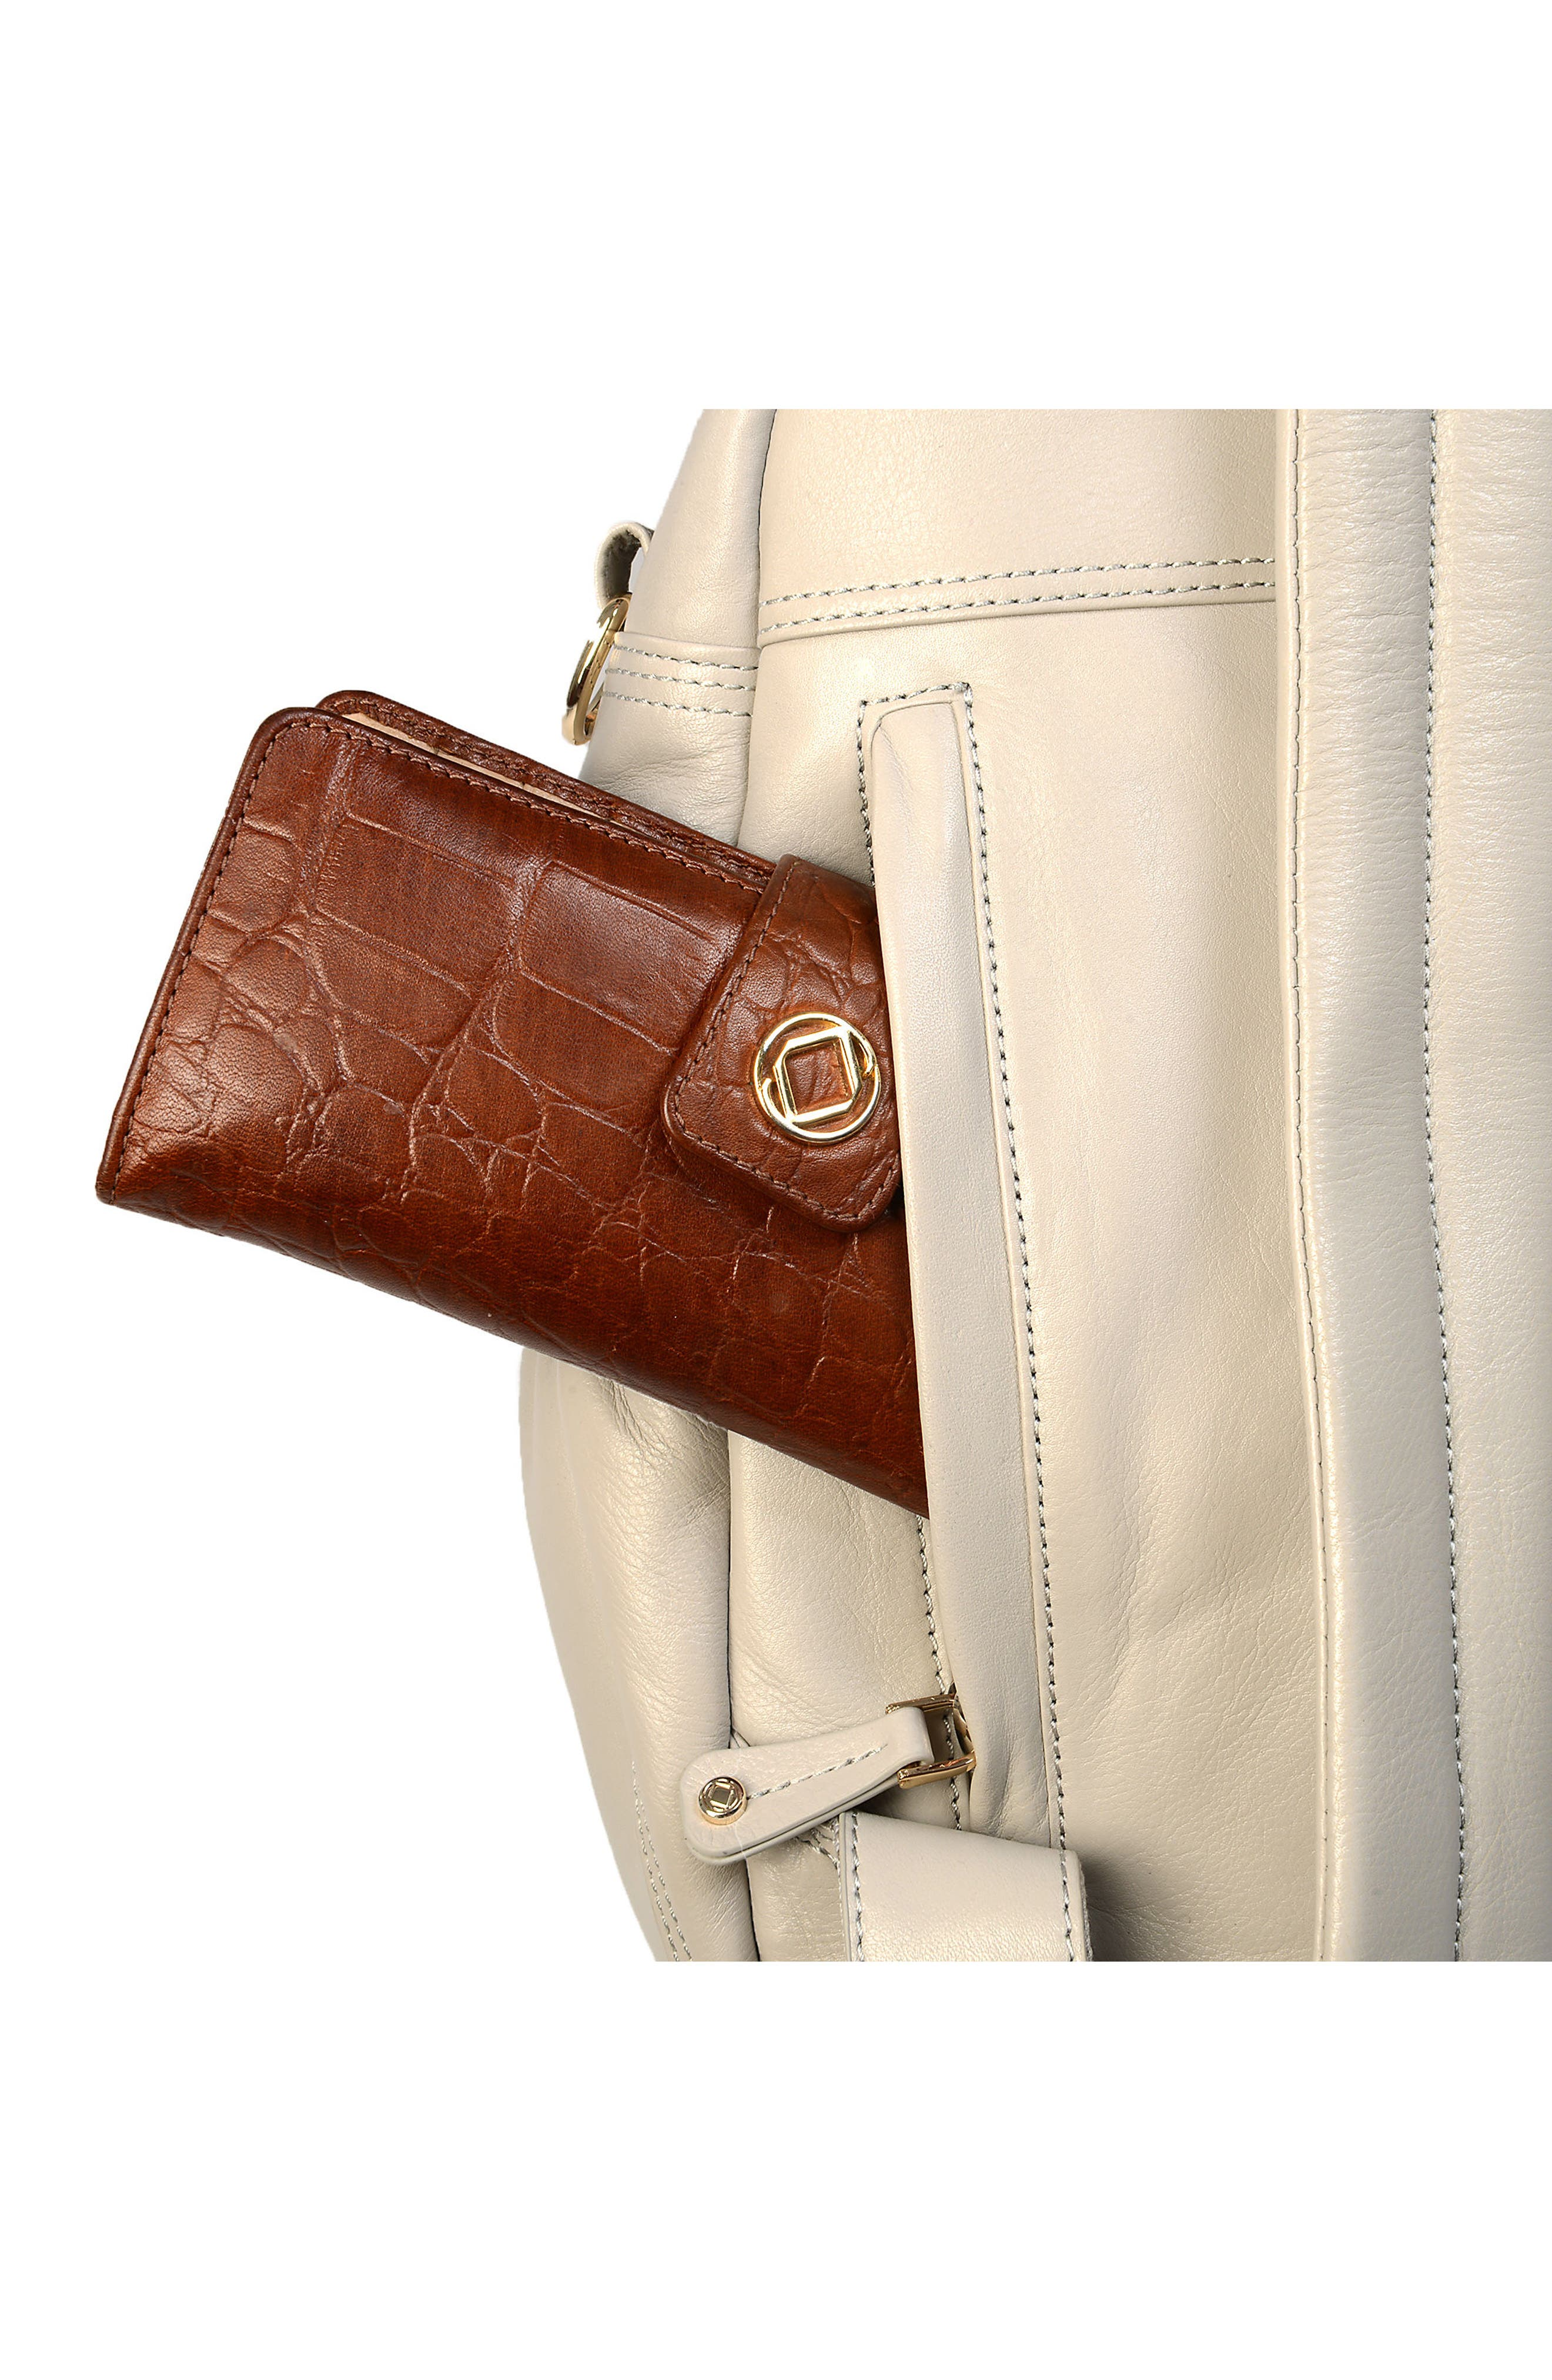 Joy XL Leather Backpack,                             Alternate thumbnail 15, color,                             Ice Grey